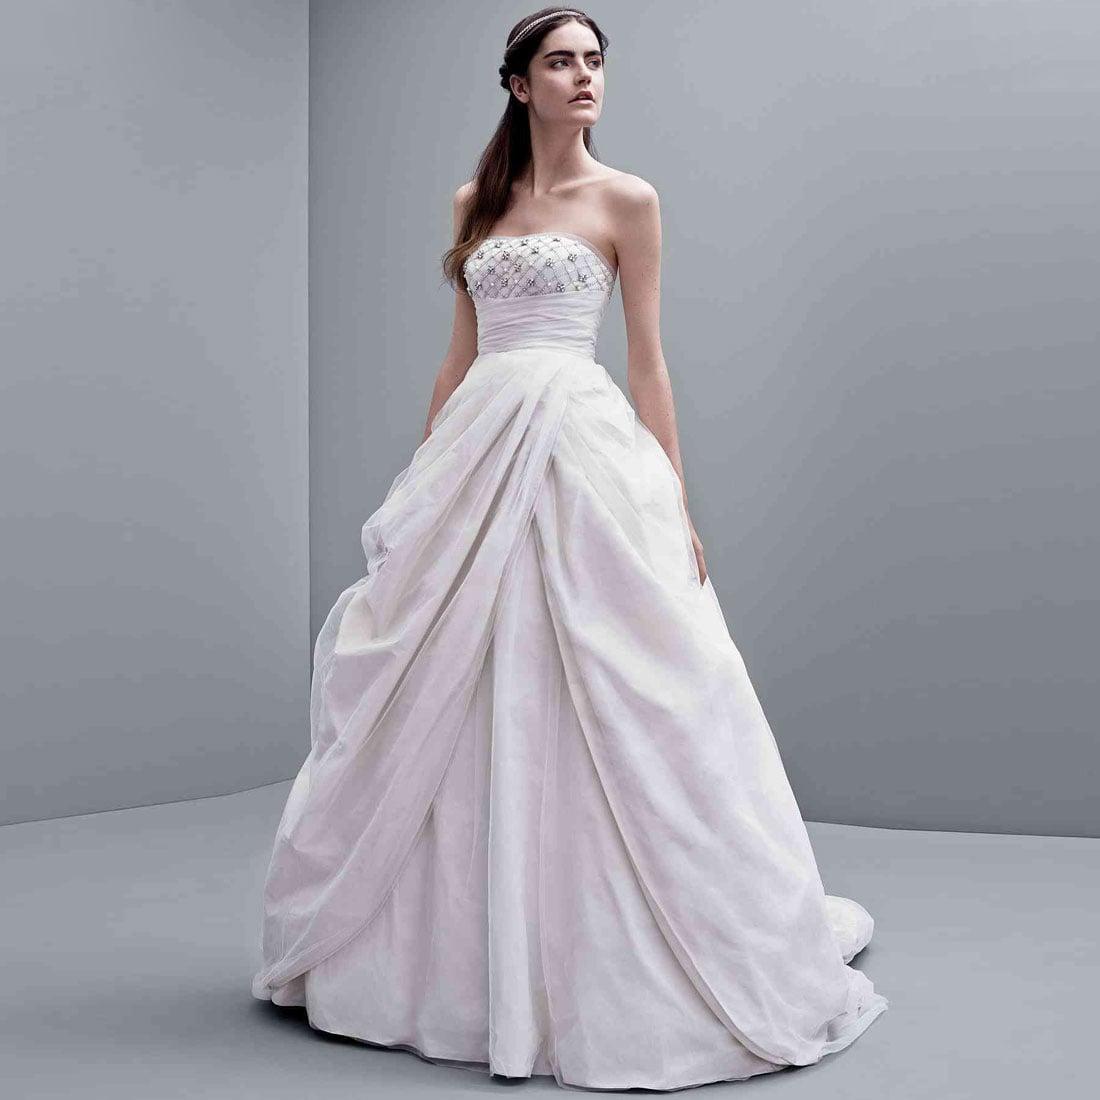 Kim Kardashian Vera Wang Dress